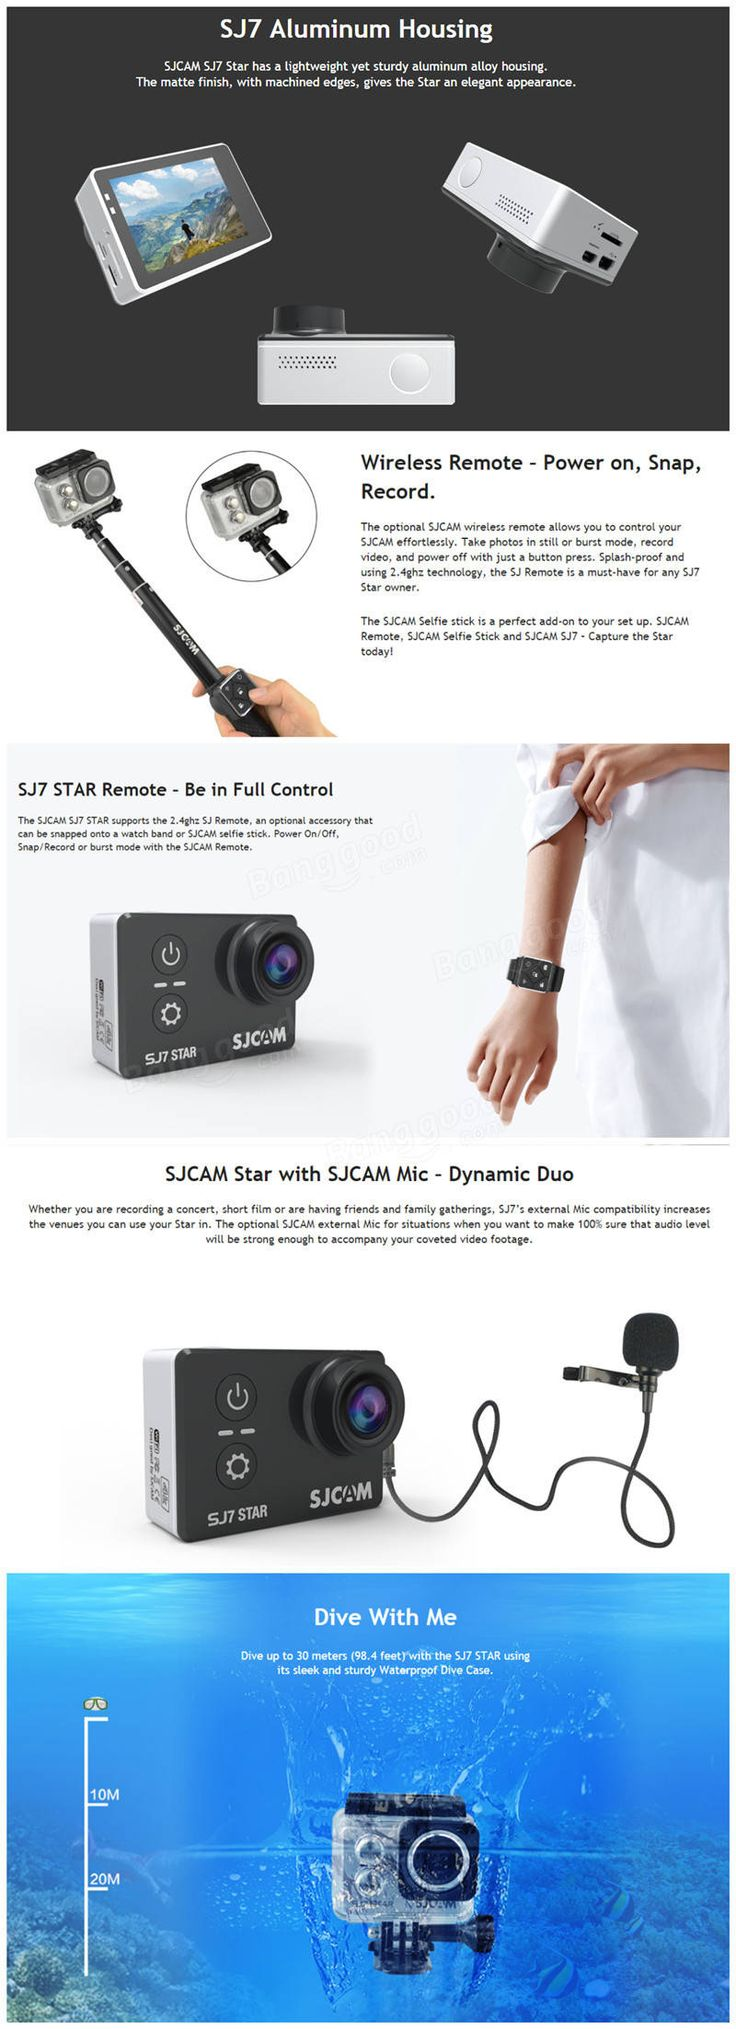 SJCAM SJ7 STAR 4K WIFI Action Camera IMX117 CMOS 2.0 Inch LCD Sport DV Ambarella A12S75  https://www.banggood.com/SJCAM-SJ7-STAR-4K-WIFI-Action-Camera-SONY-IMX117-CMOS-2_0-Inch-LCD-Sport-DV-Ambarella-A12S75-p-1087999.html?p=SF1215375298201312PR